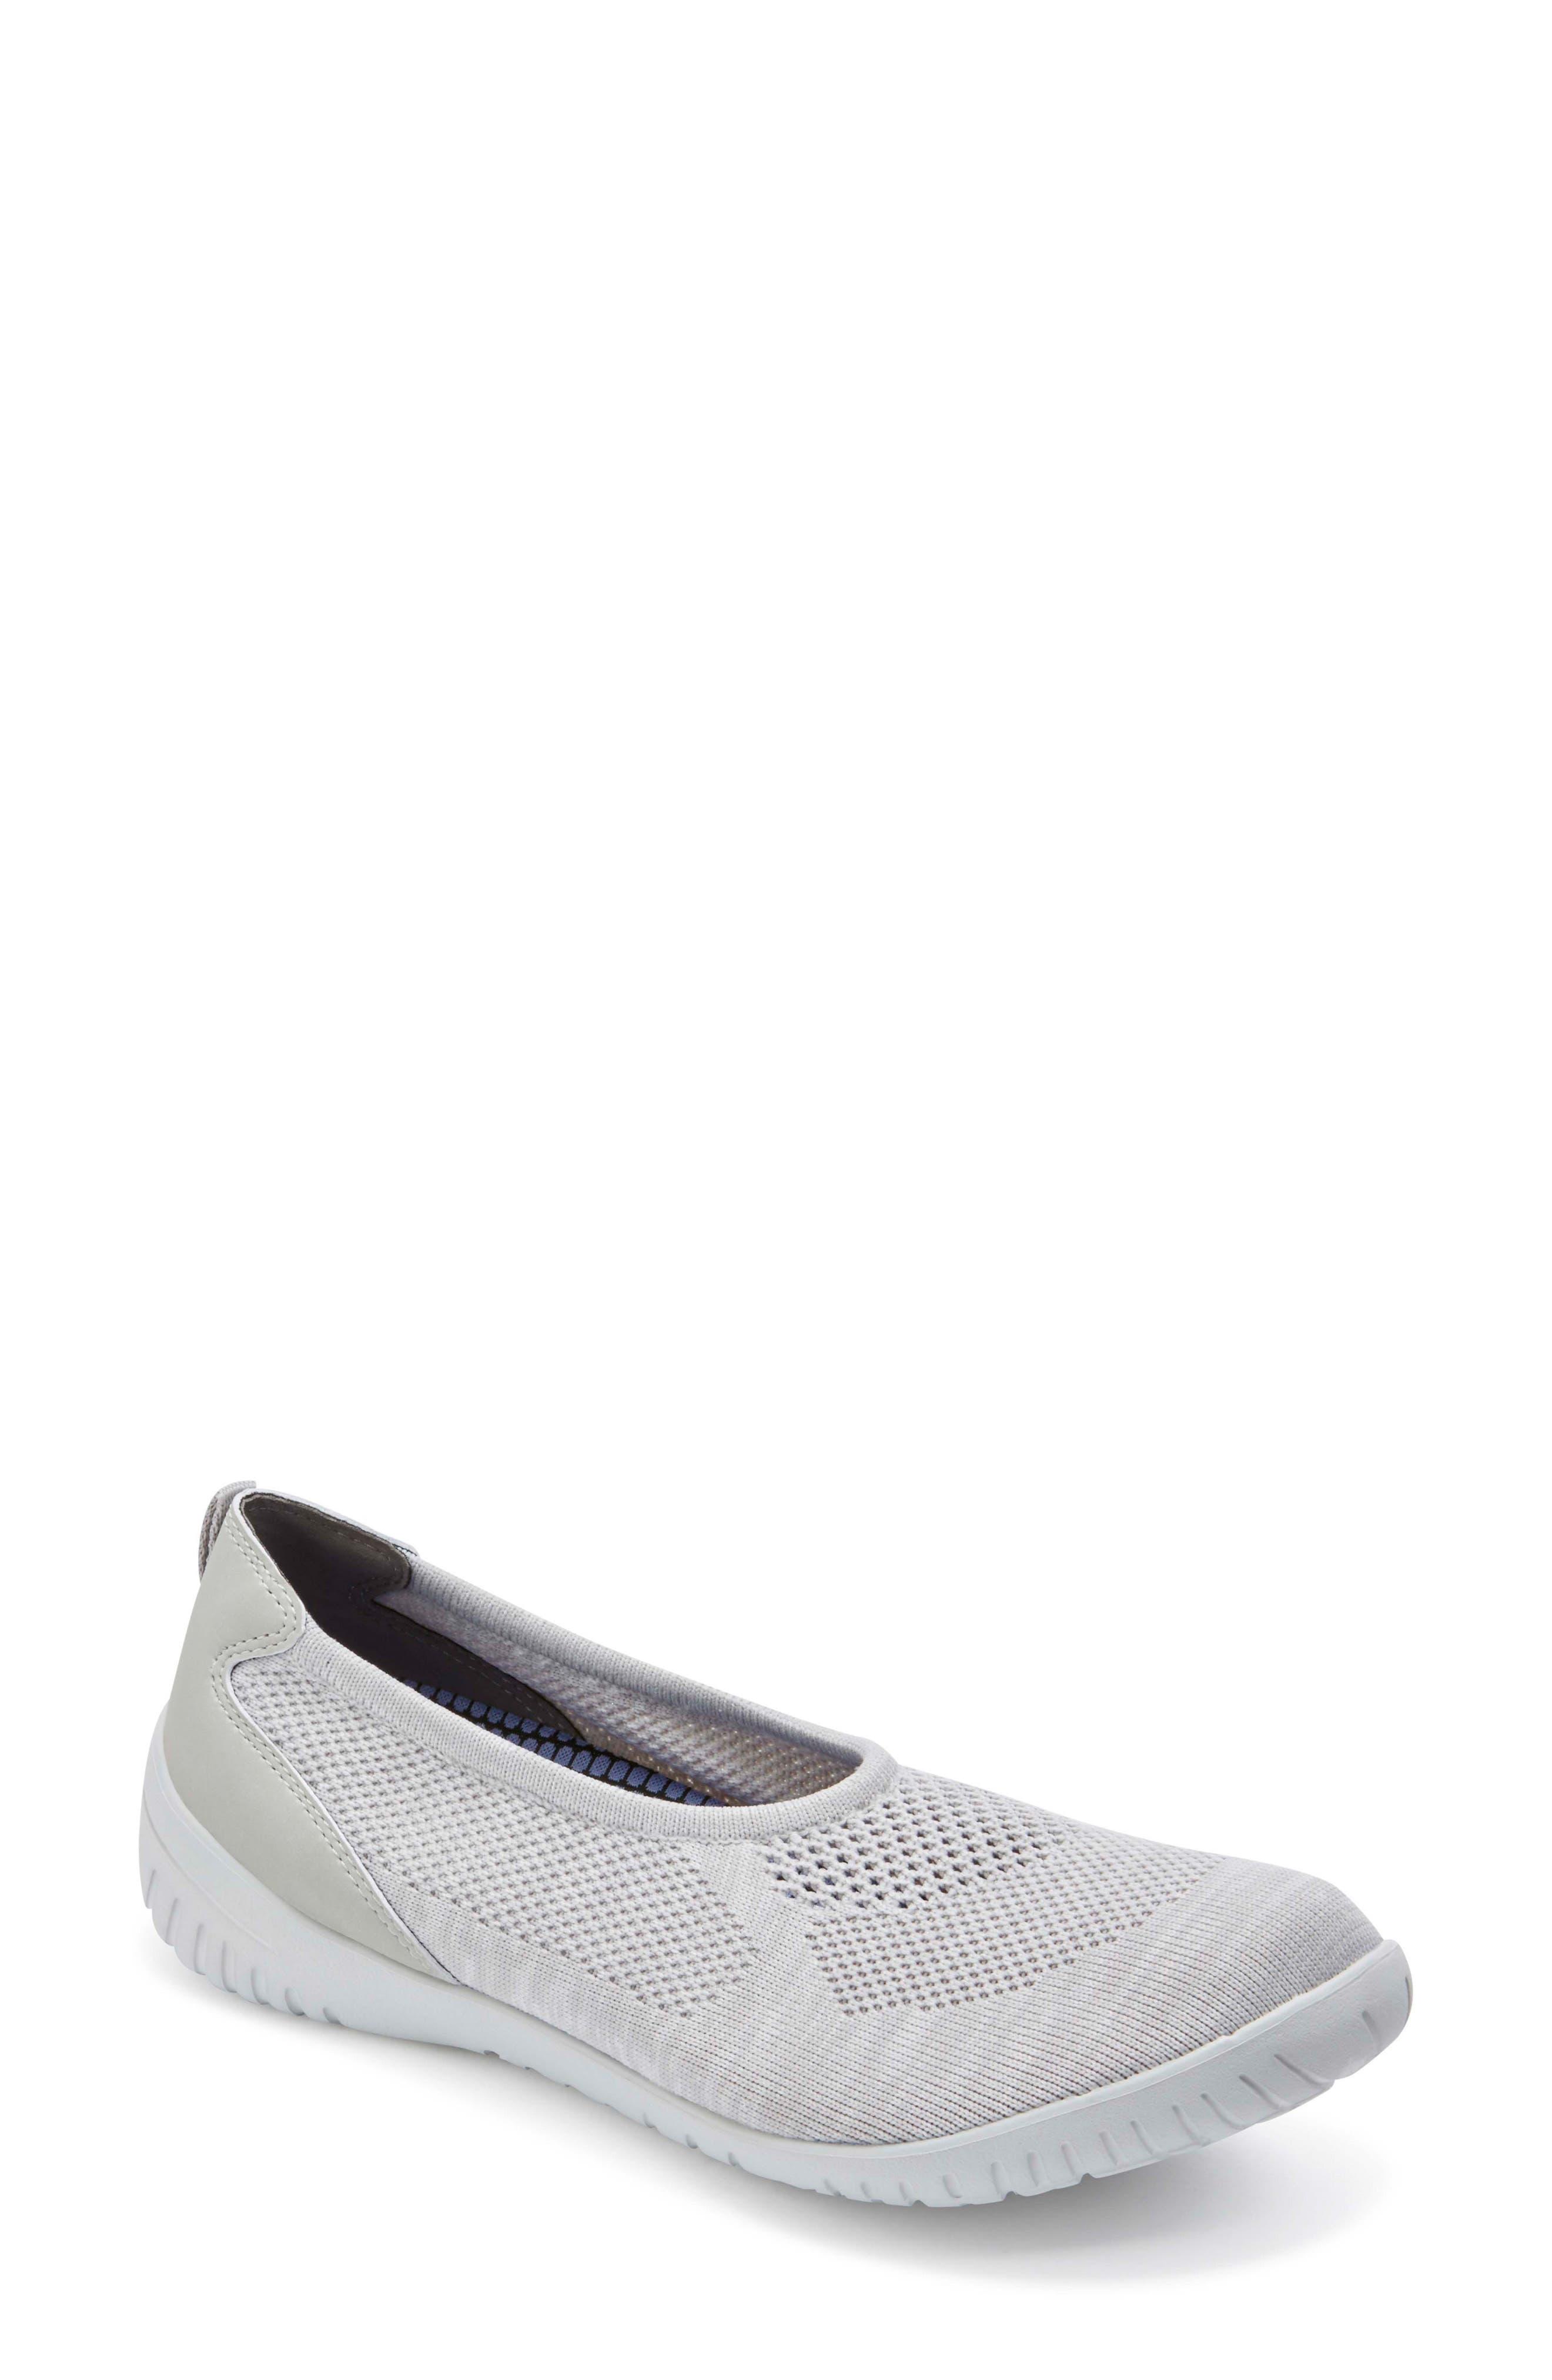 Alternate Image 1 Selected - Rockport Raelyn Knit Ballet Sneaker (Women)